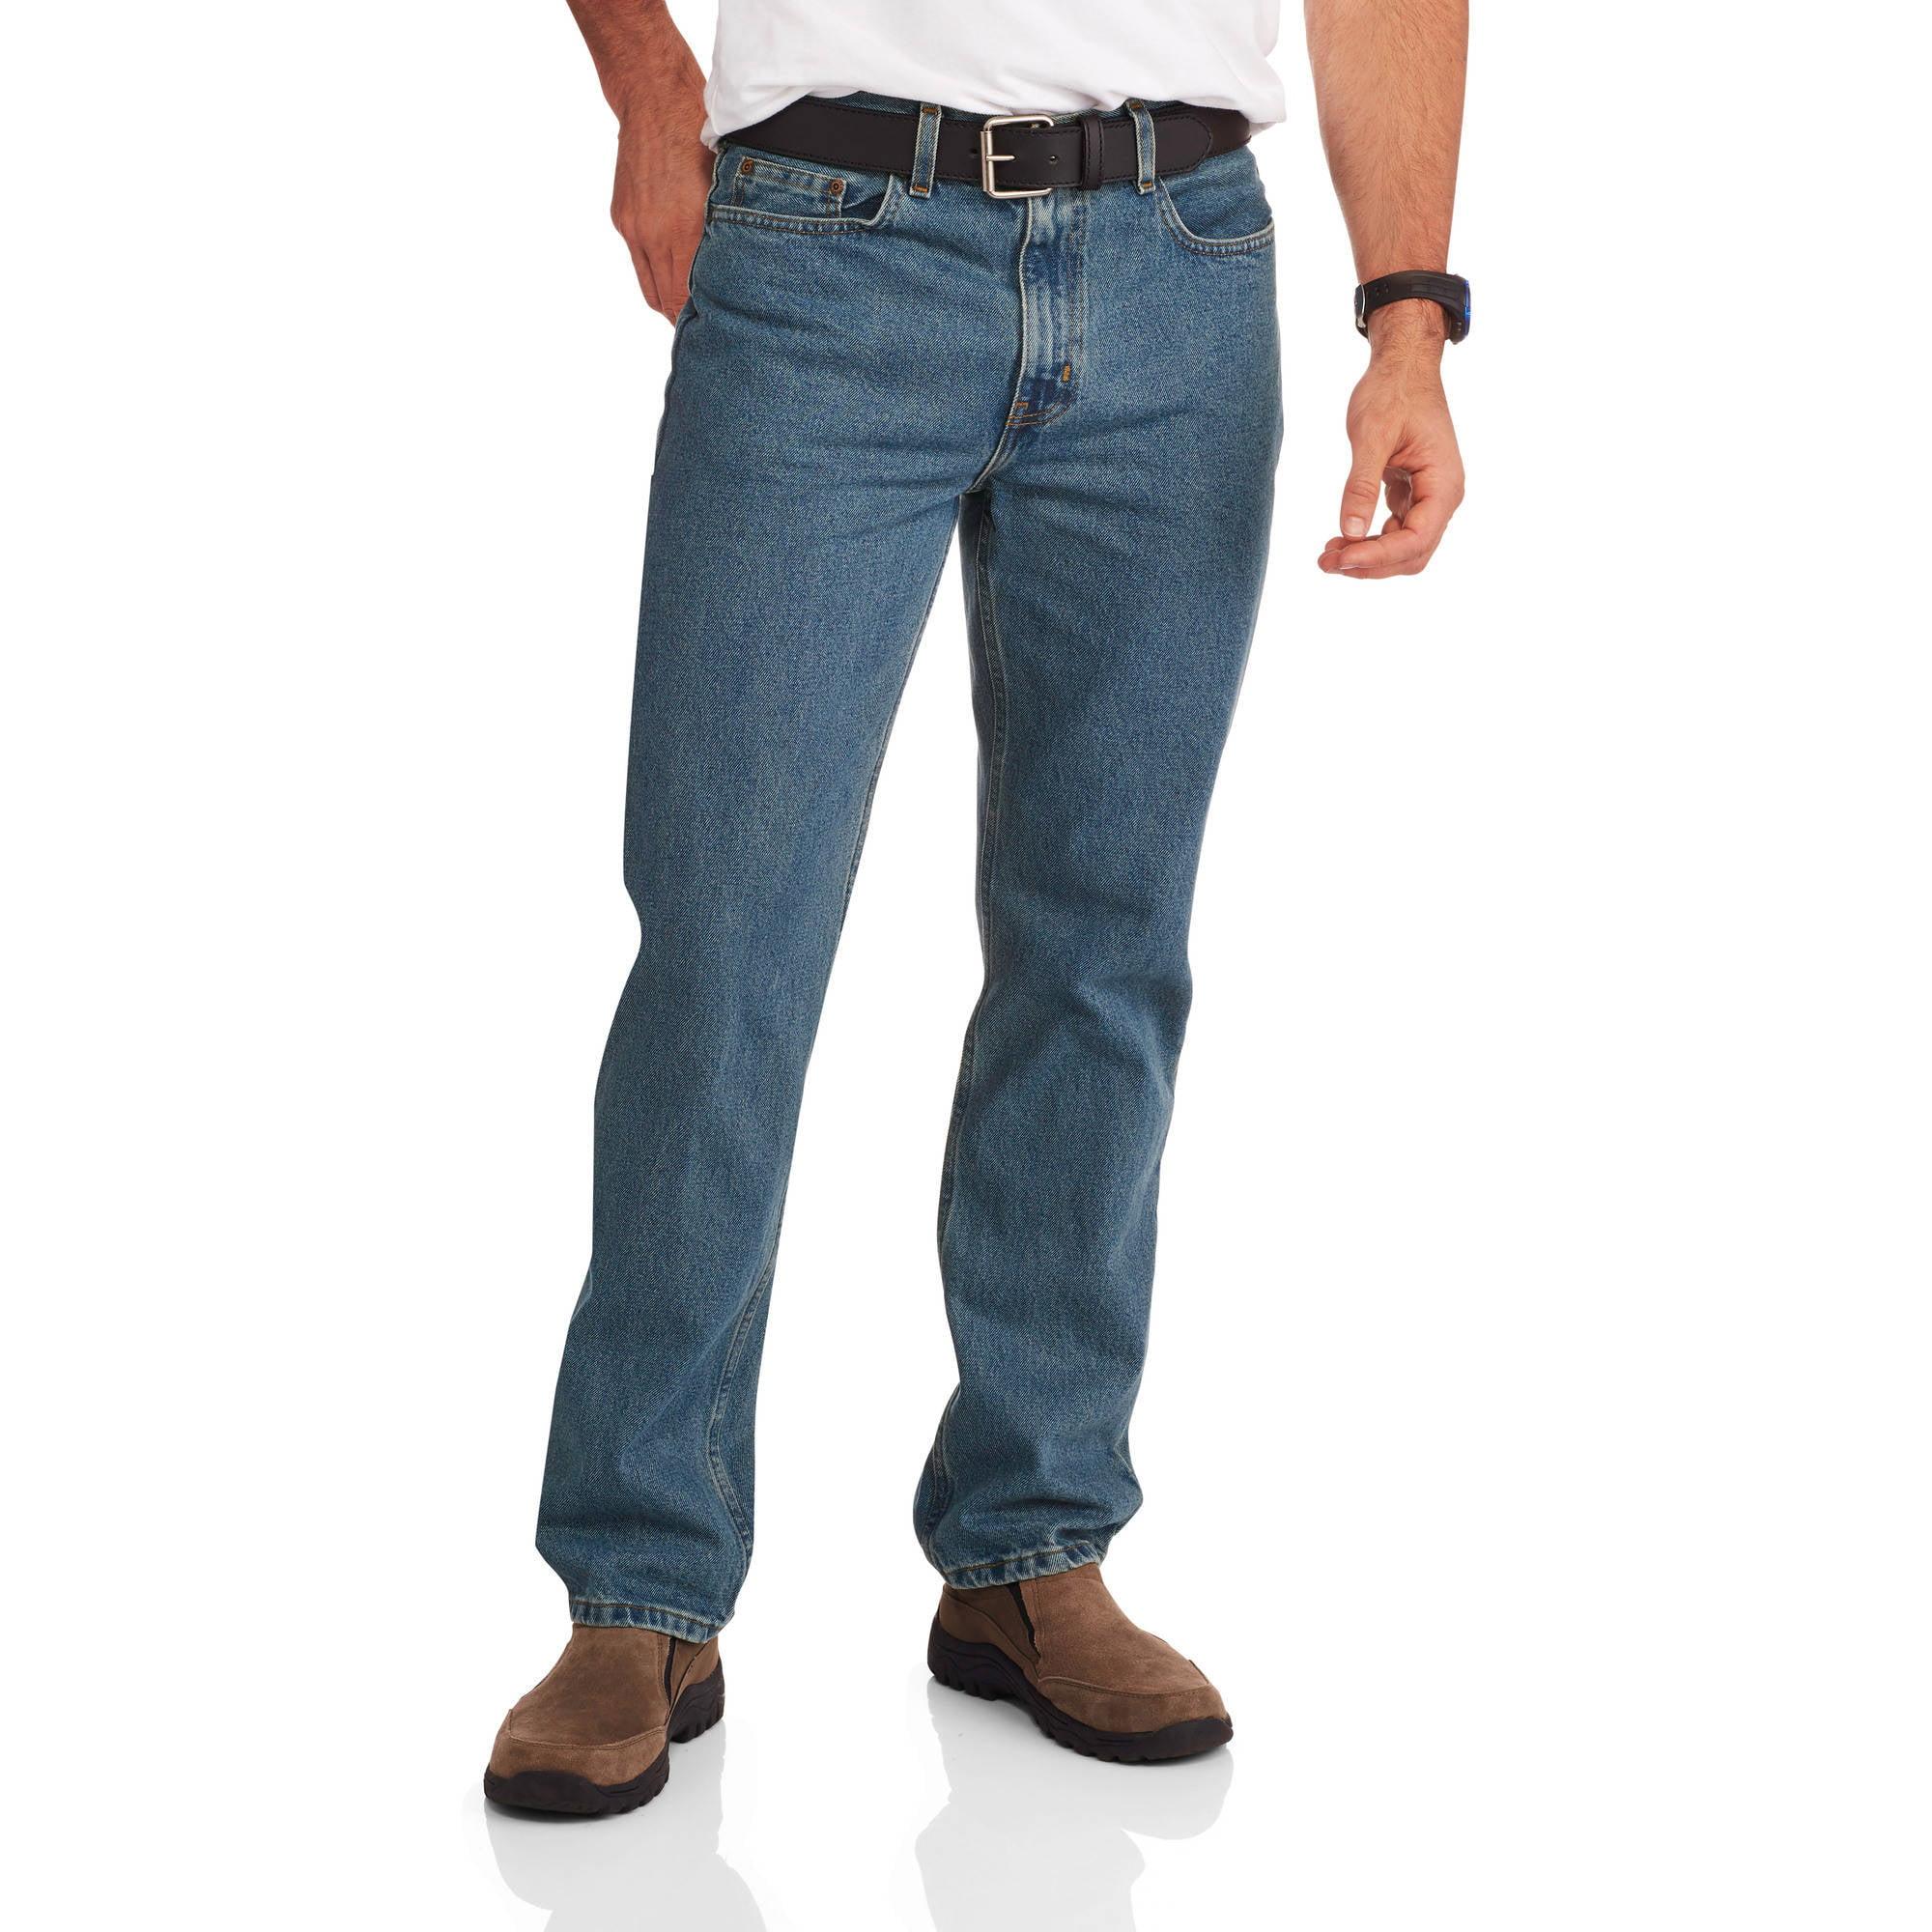 Mens Jeans 36x29